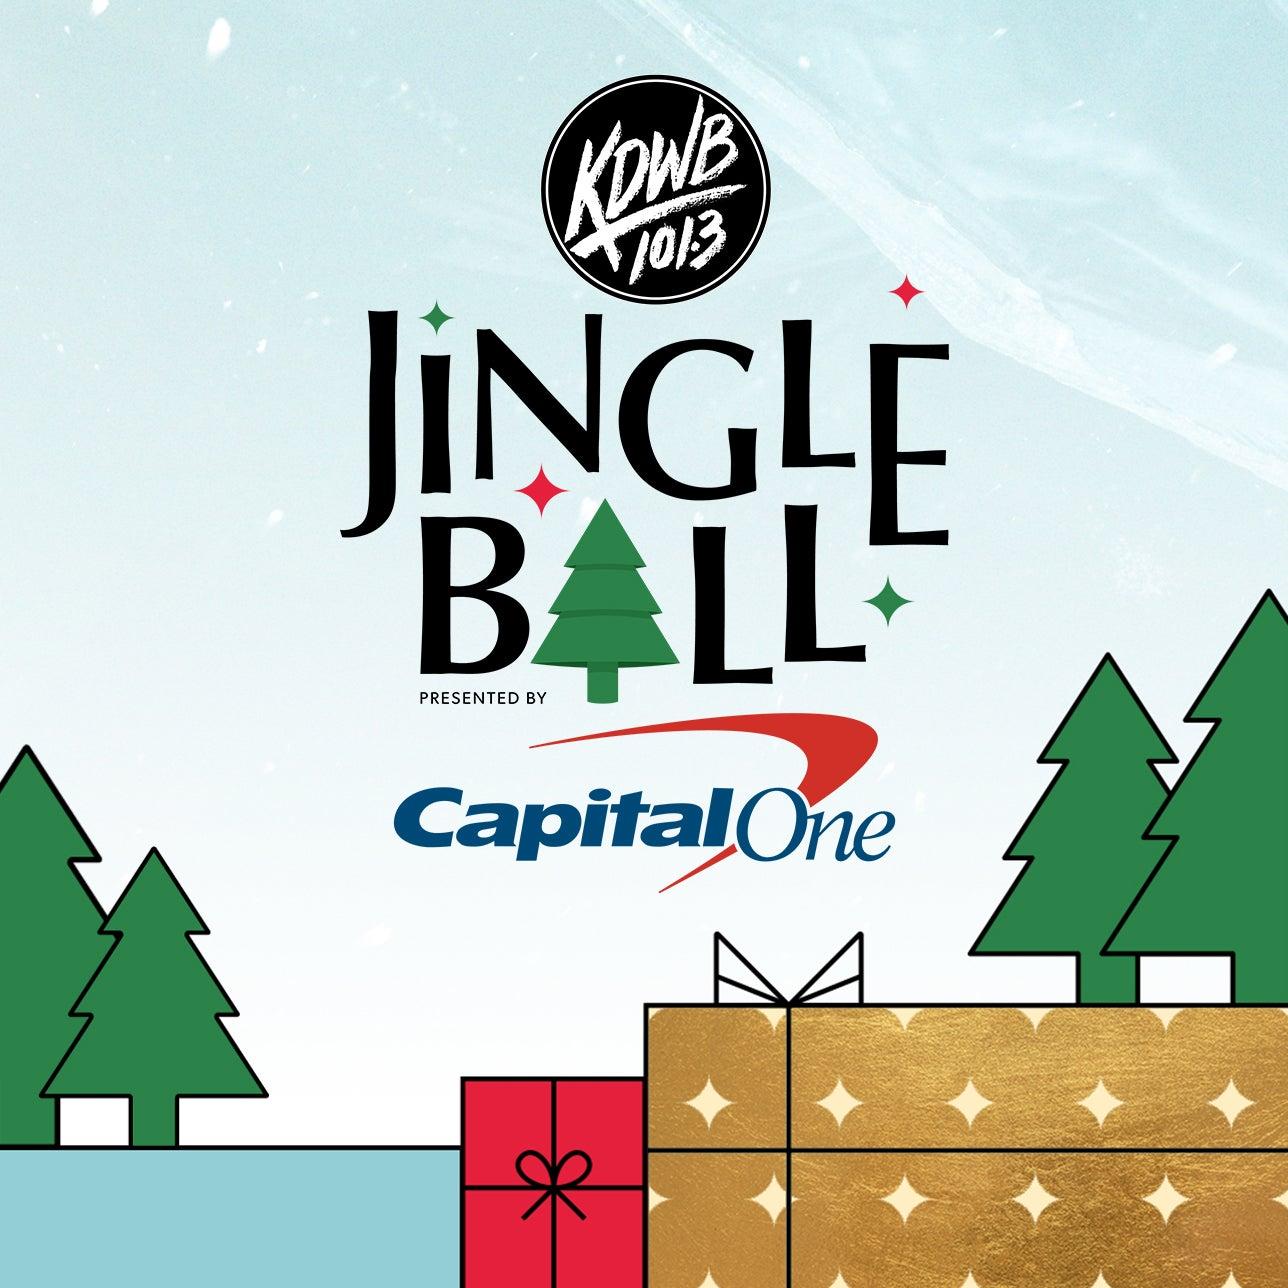 101.3 KDWB's Jingle Ball